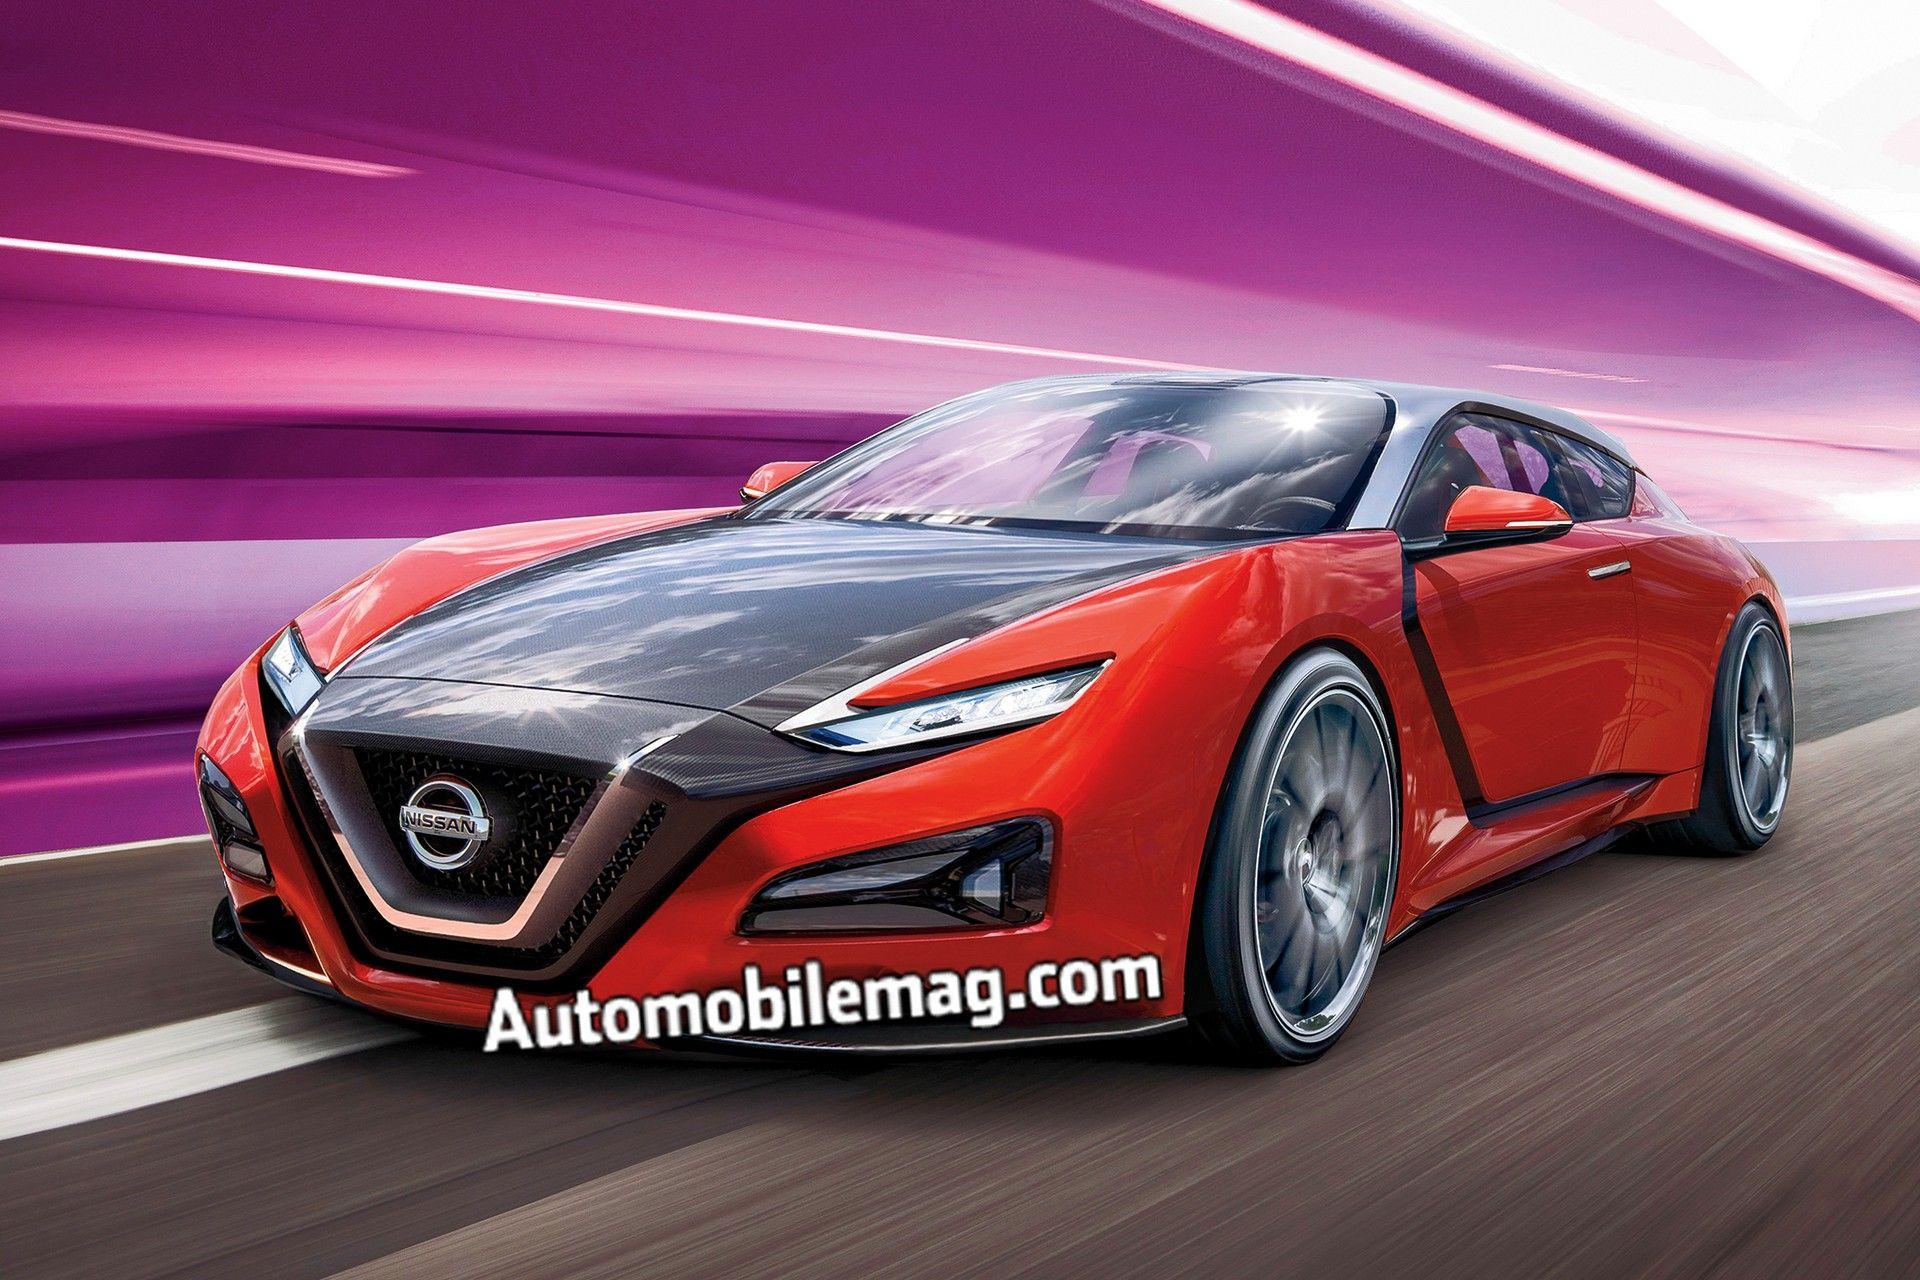 2020 Nissan Z Render Nissan Z Nissan Concept Cars